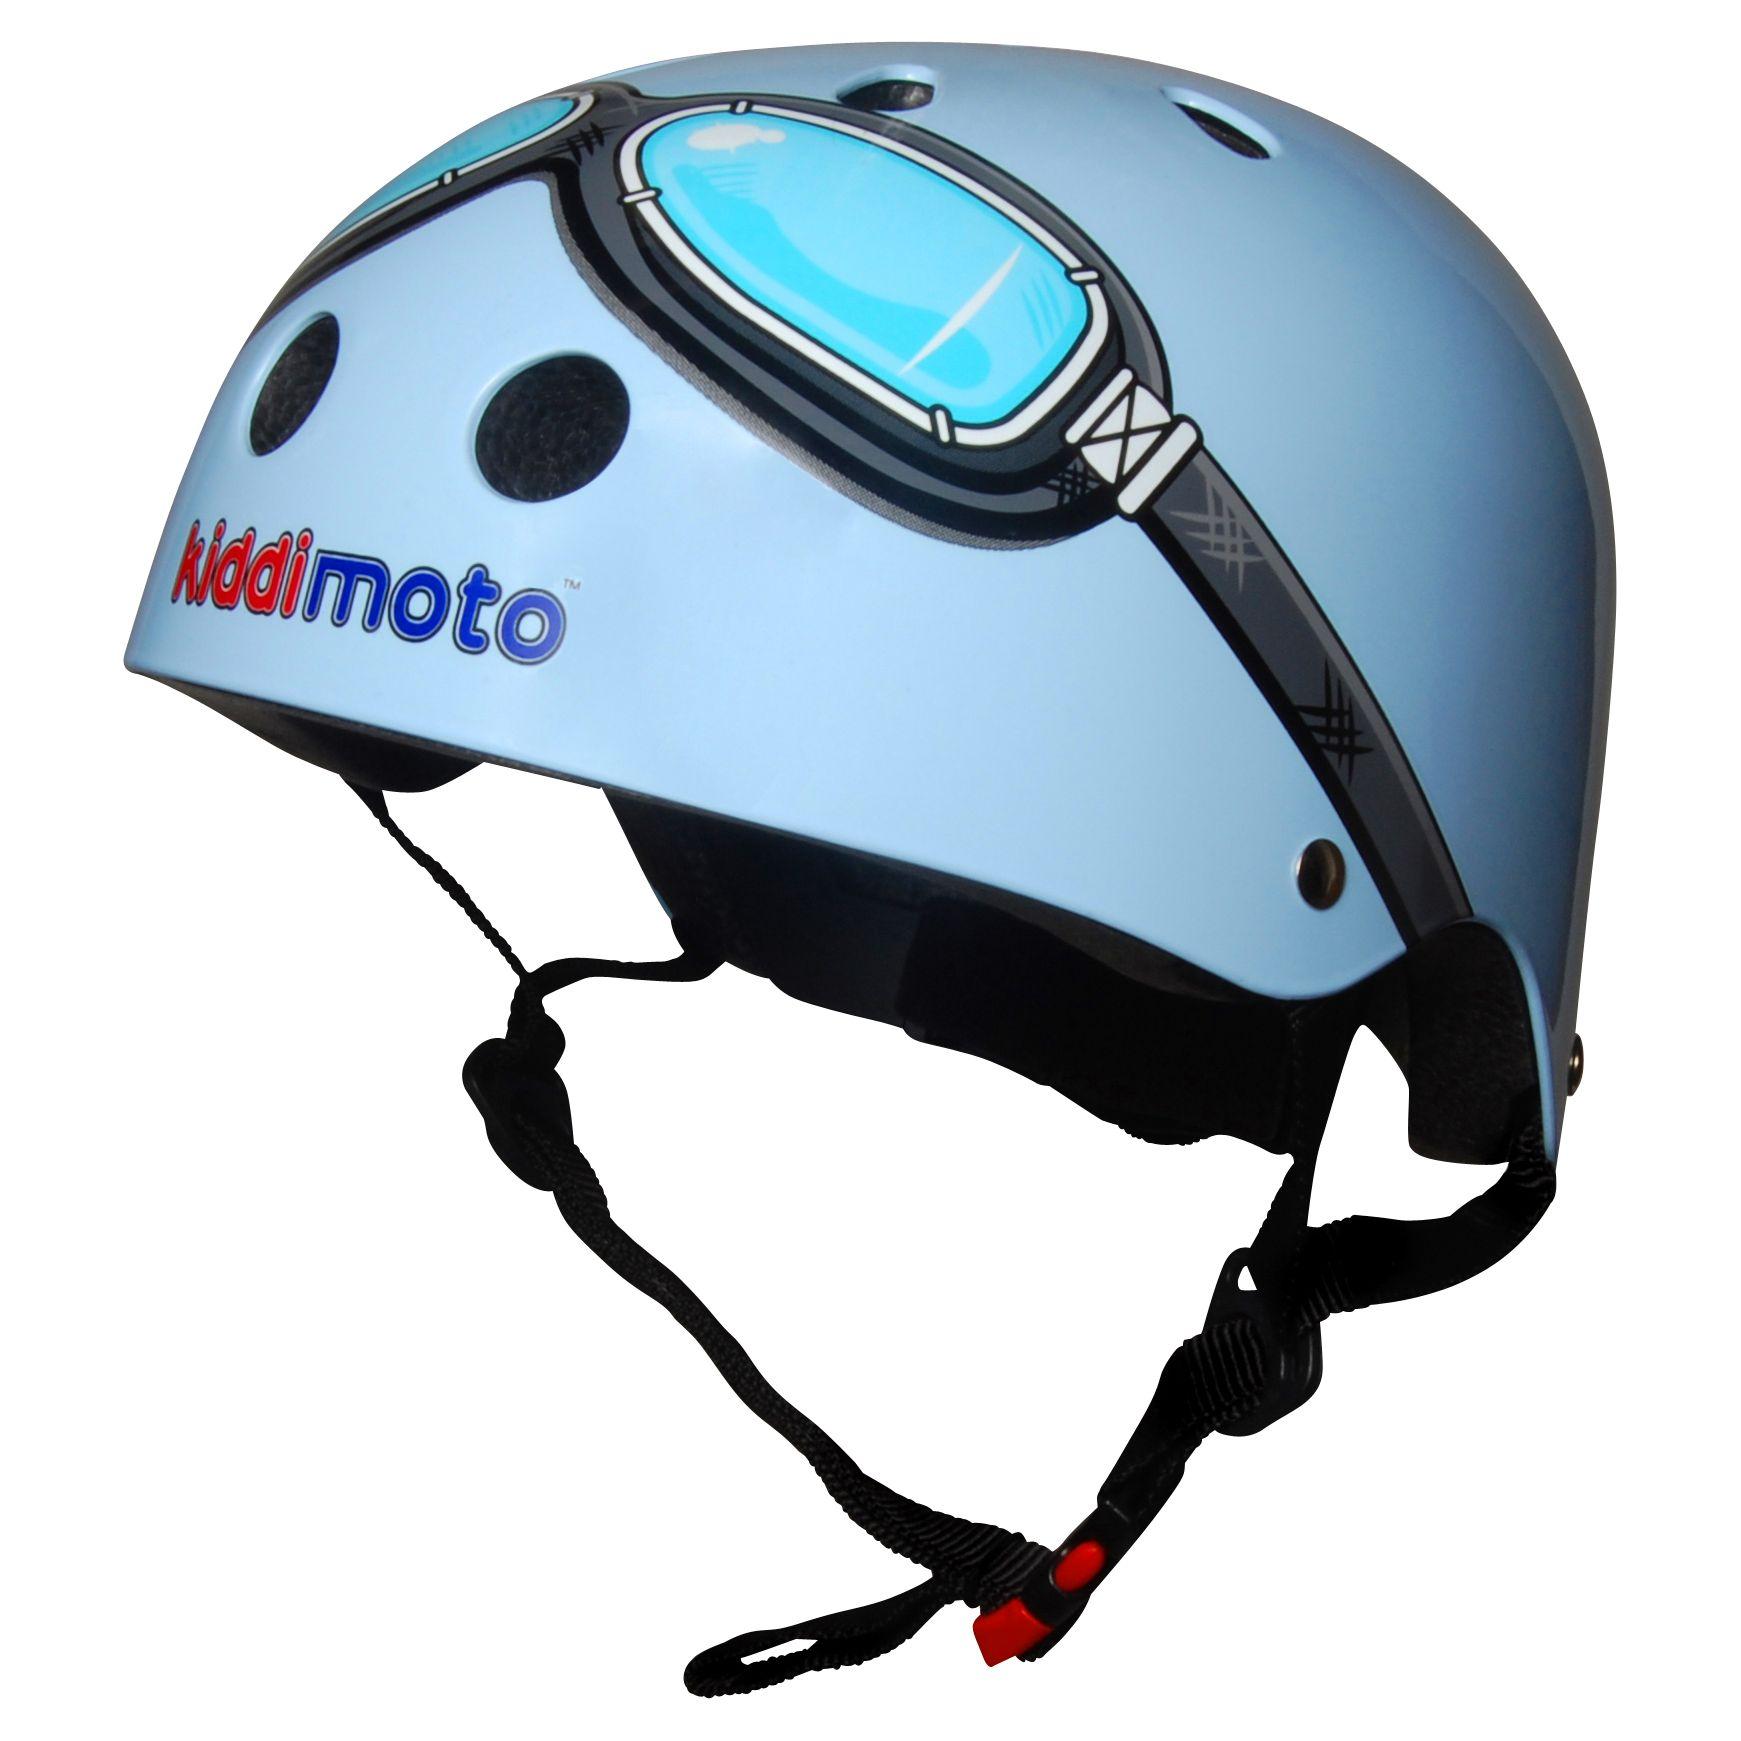 Kiddimoto Kiddimoto Blue Goggles Helmet, Small